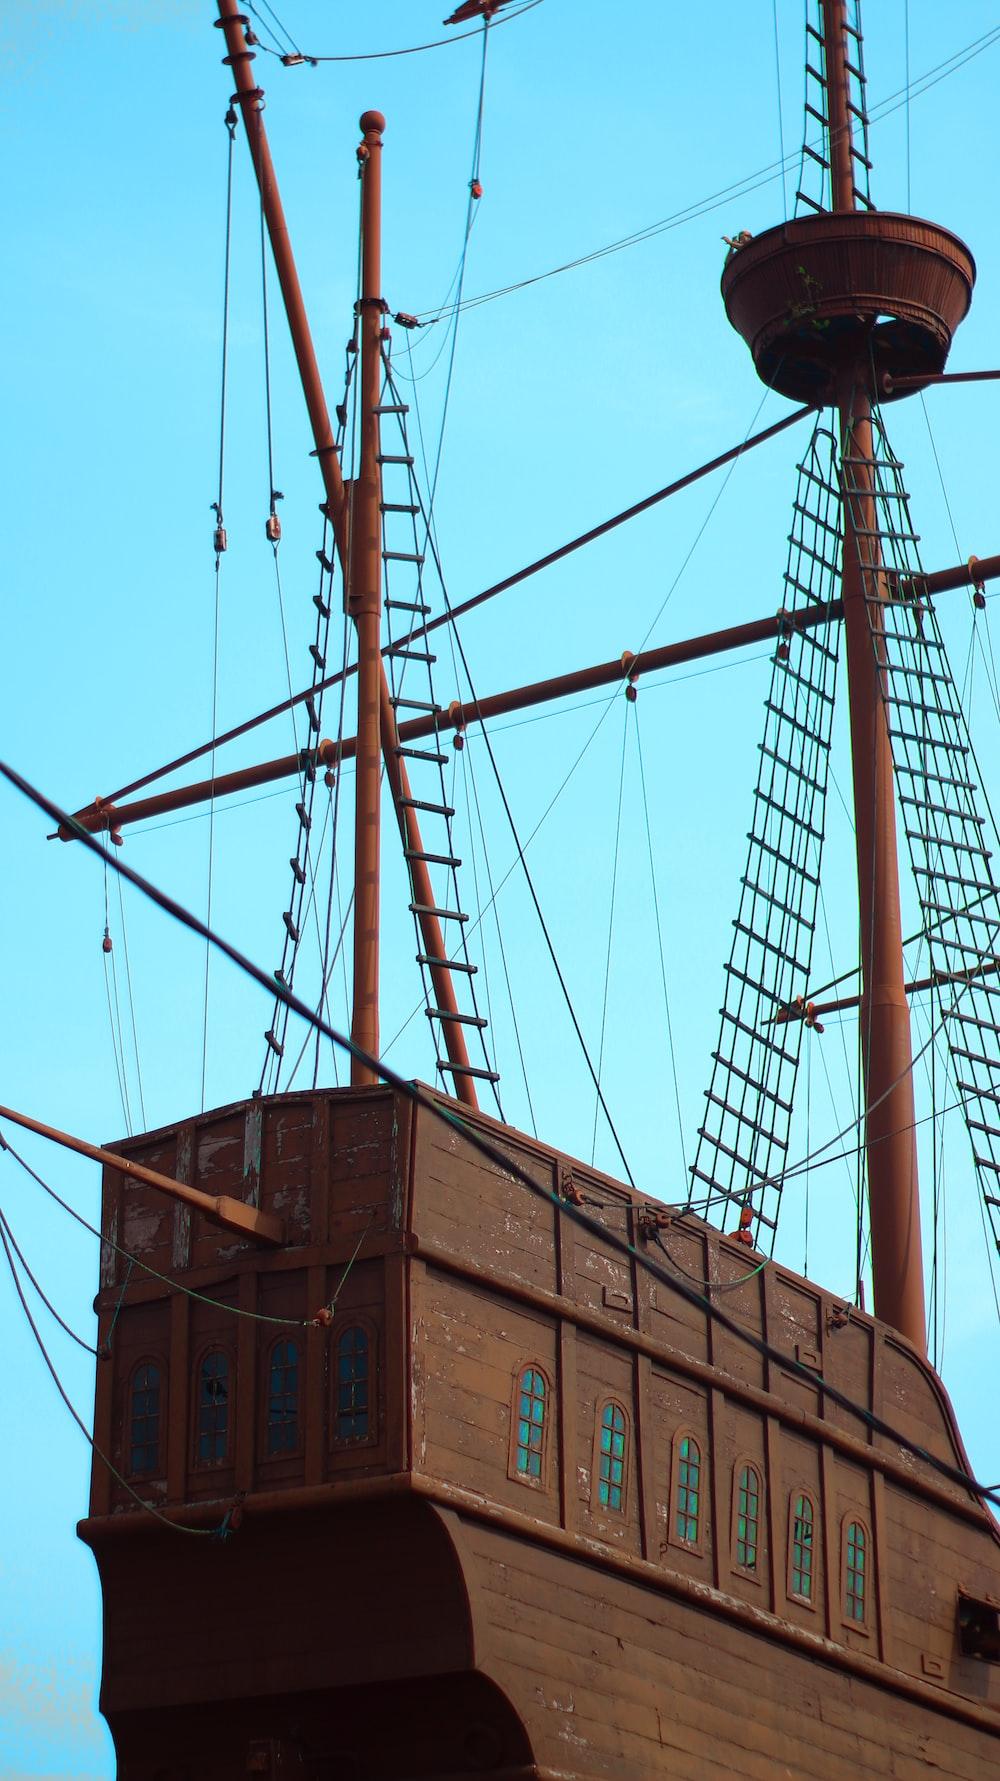 brown ship